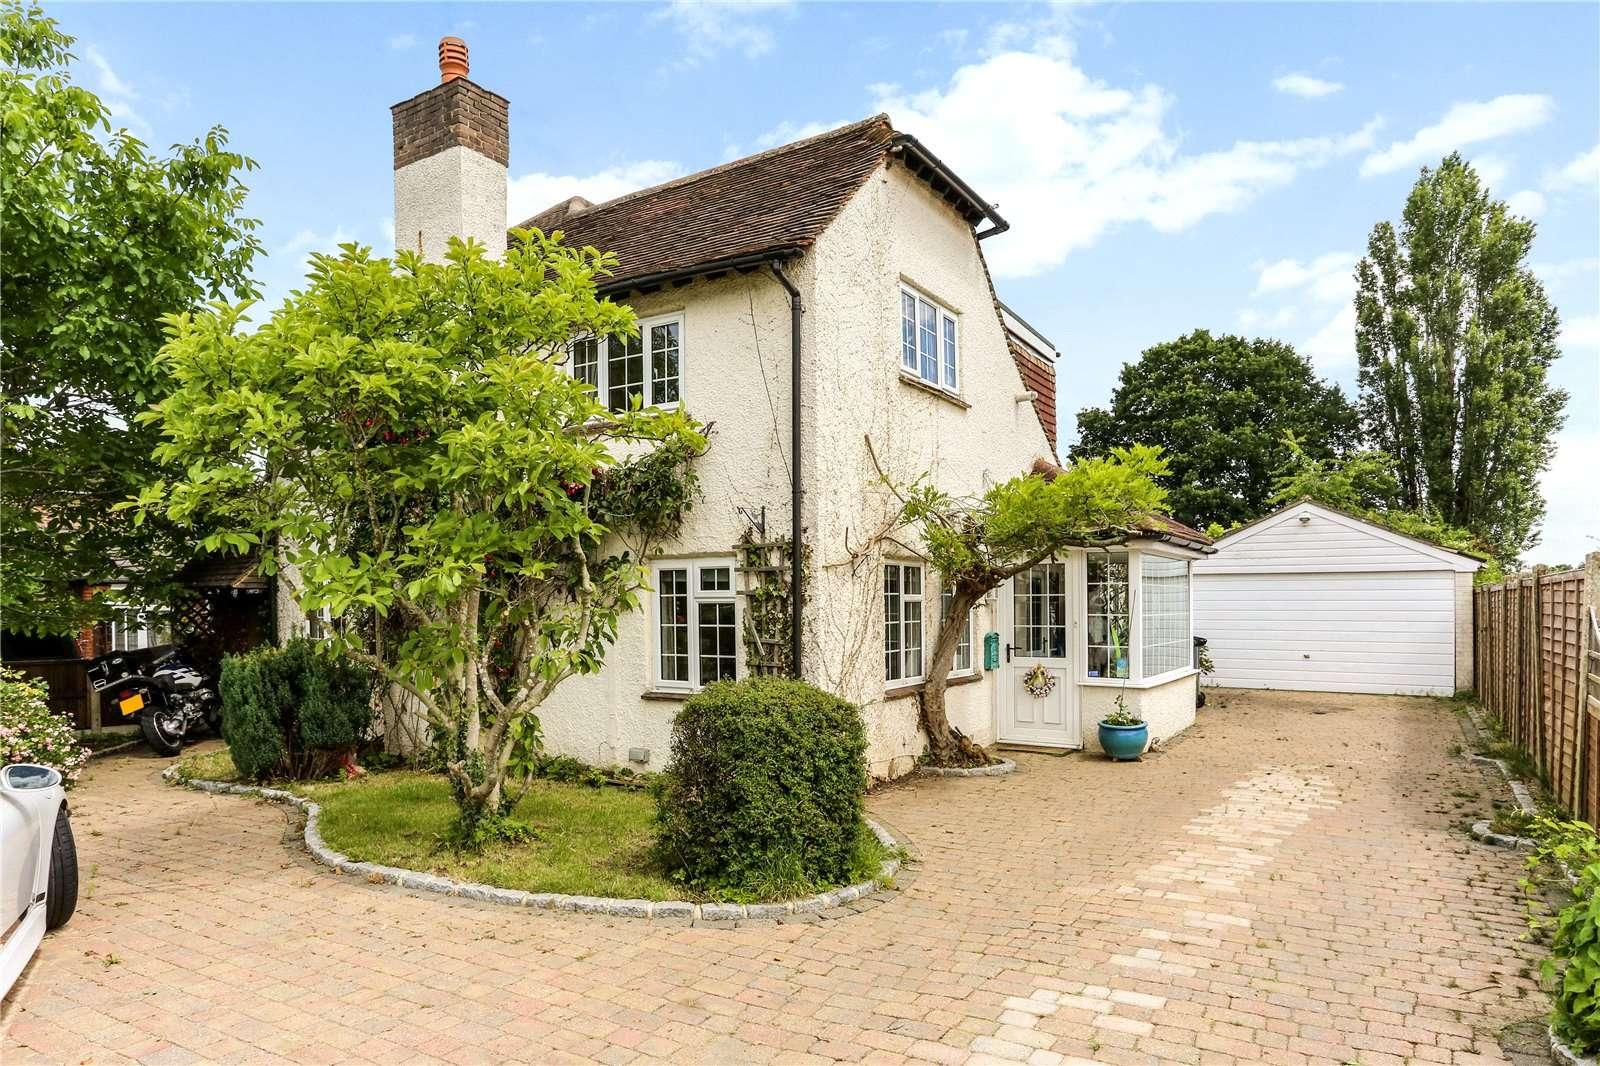 Glaziers Lane Normandy Guildford Surrey Gu3 2ea Properties For Sale Savills